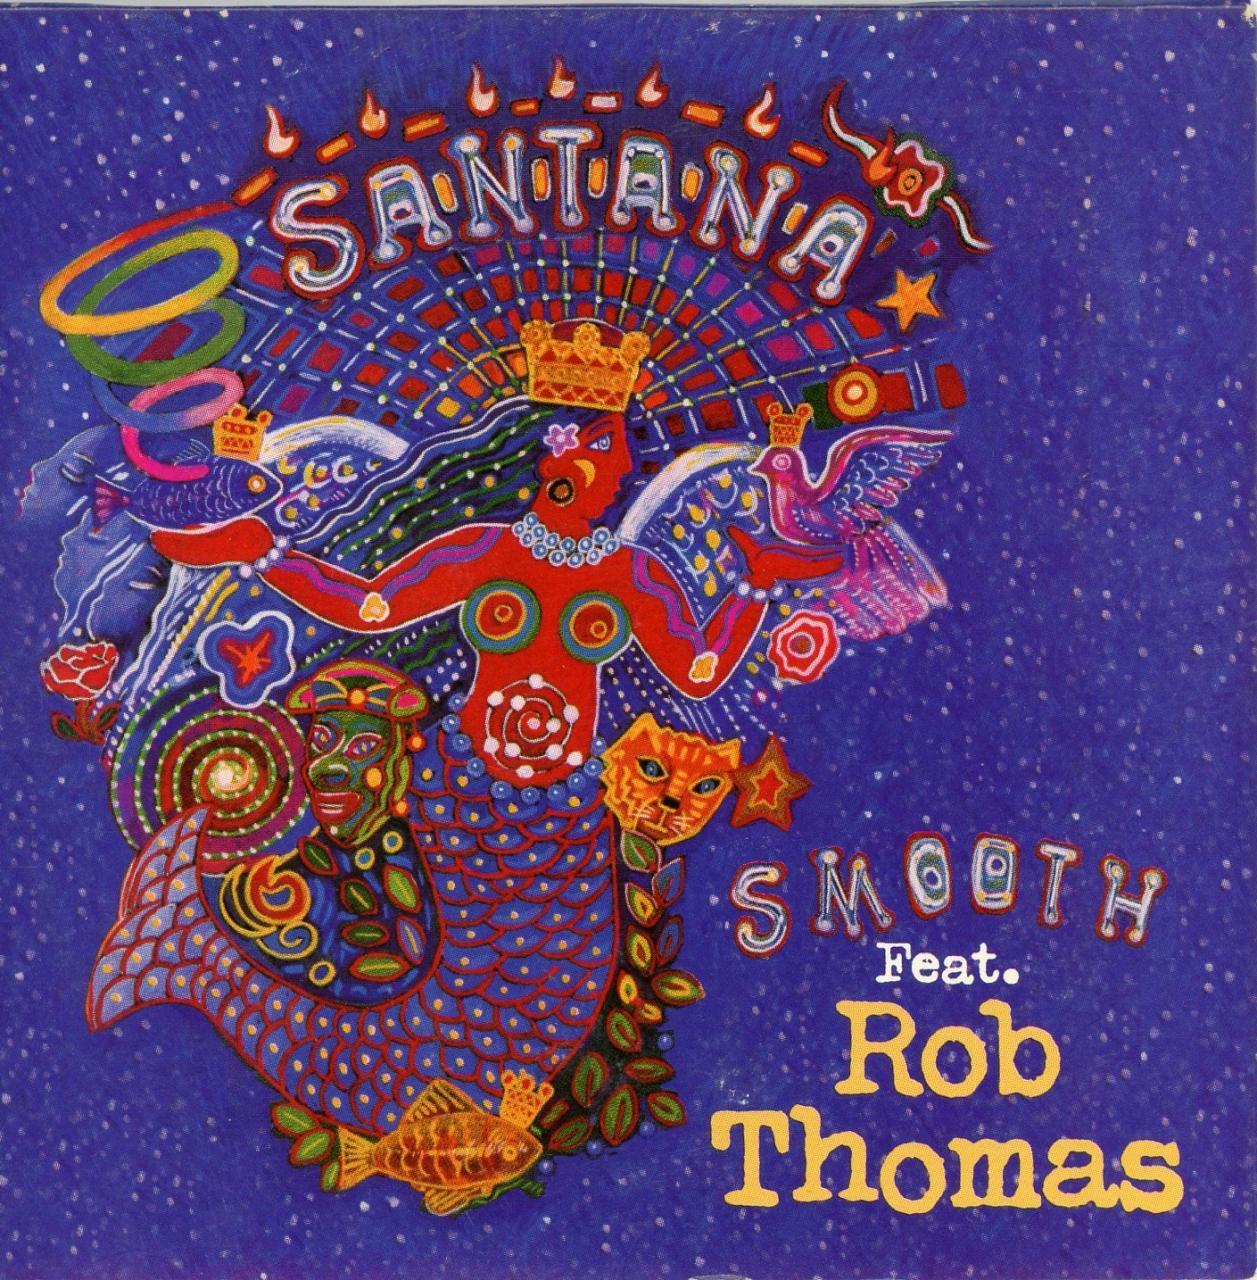 Santana - Smooth Ft. Rob Thomas mp3 download